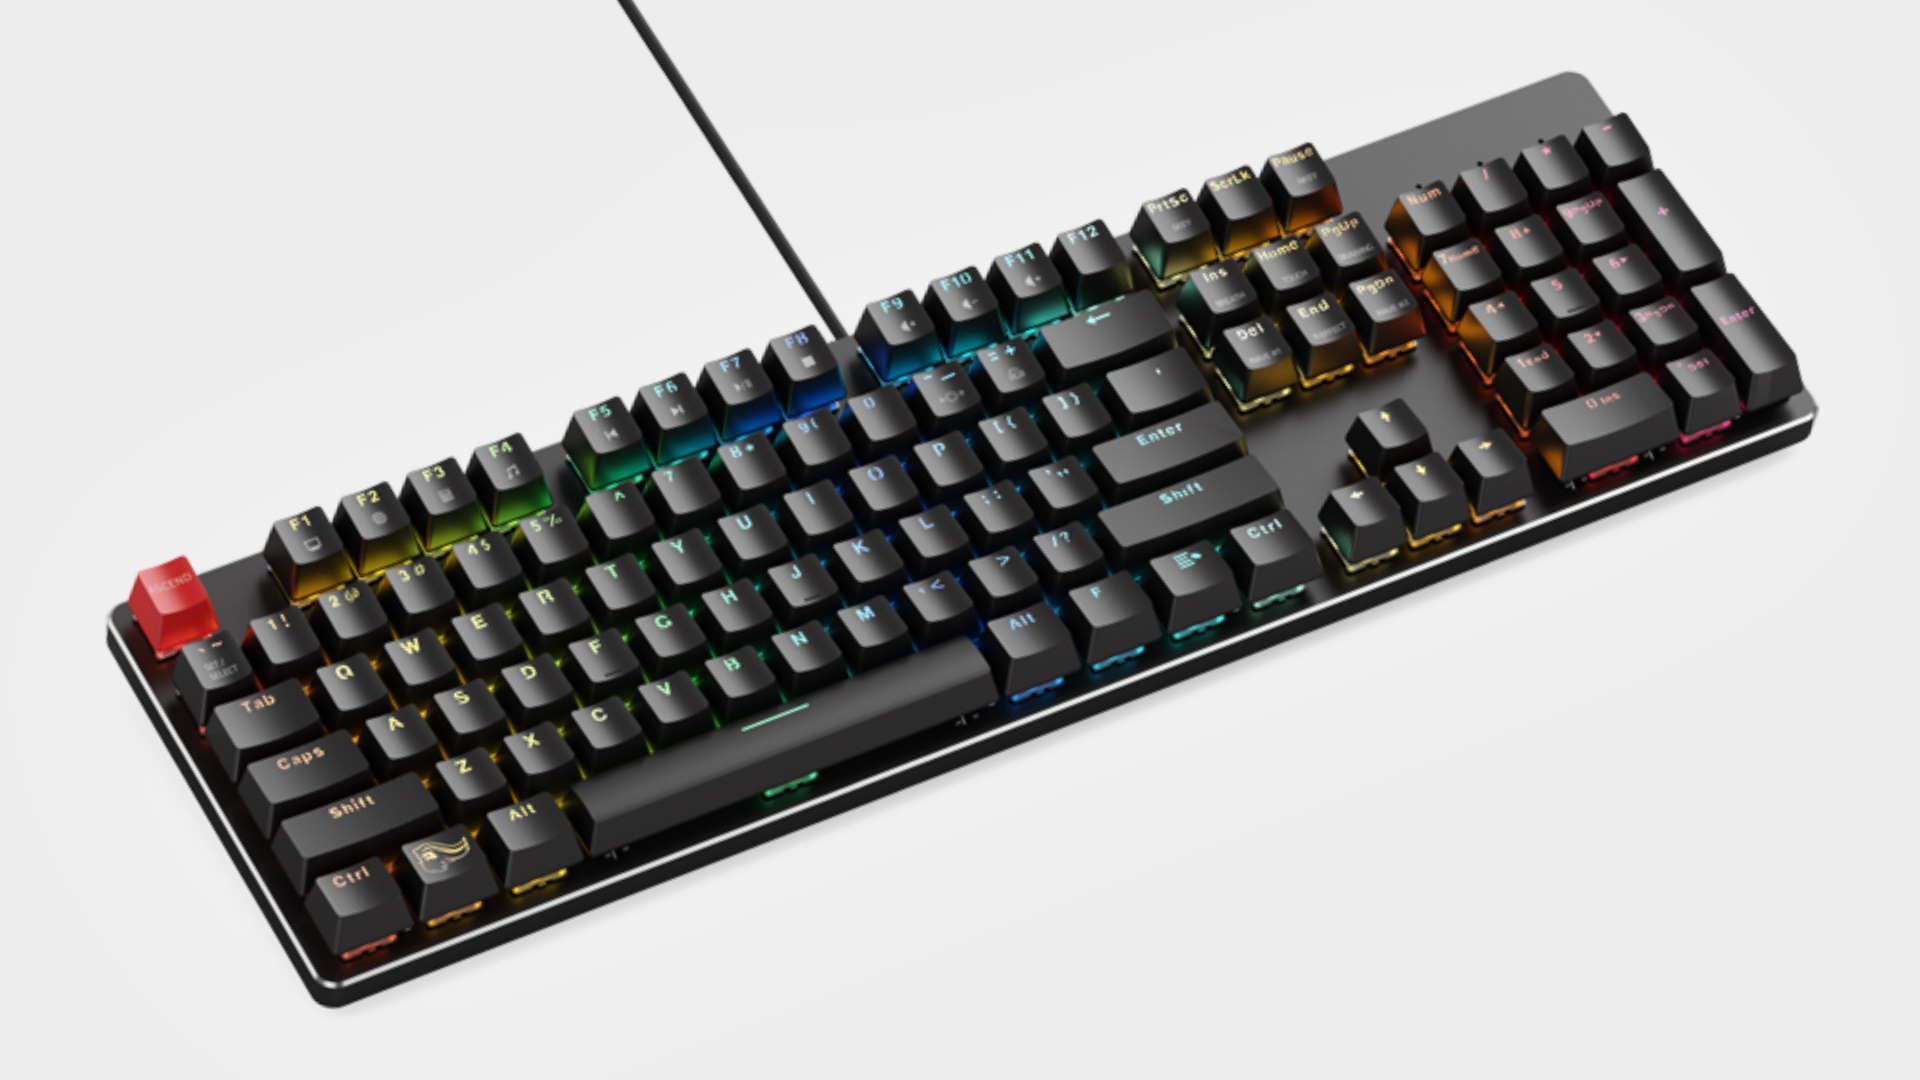 Glorious Modular Mechanical Keyboard (GMMK) review